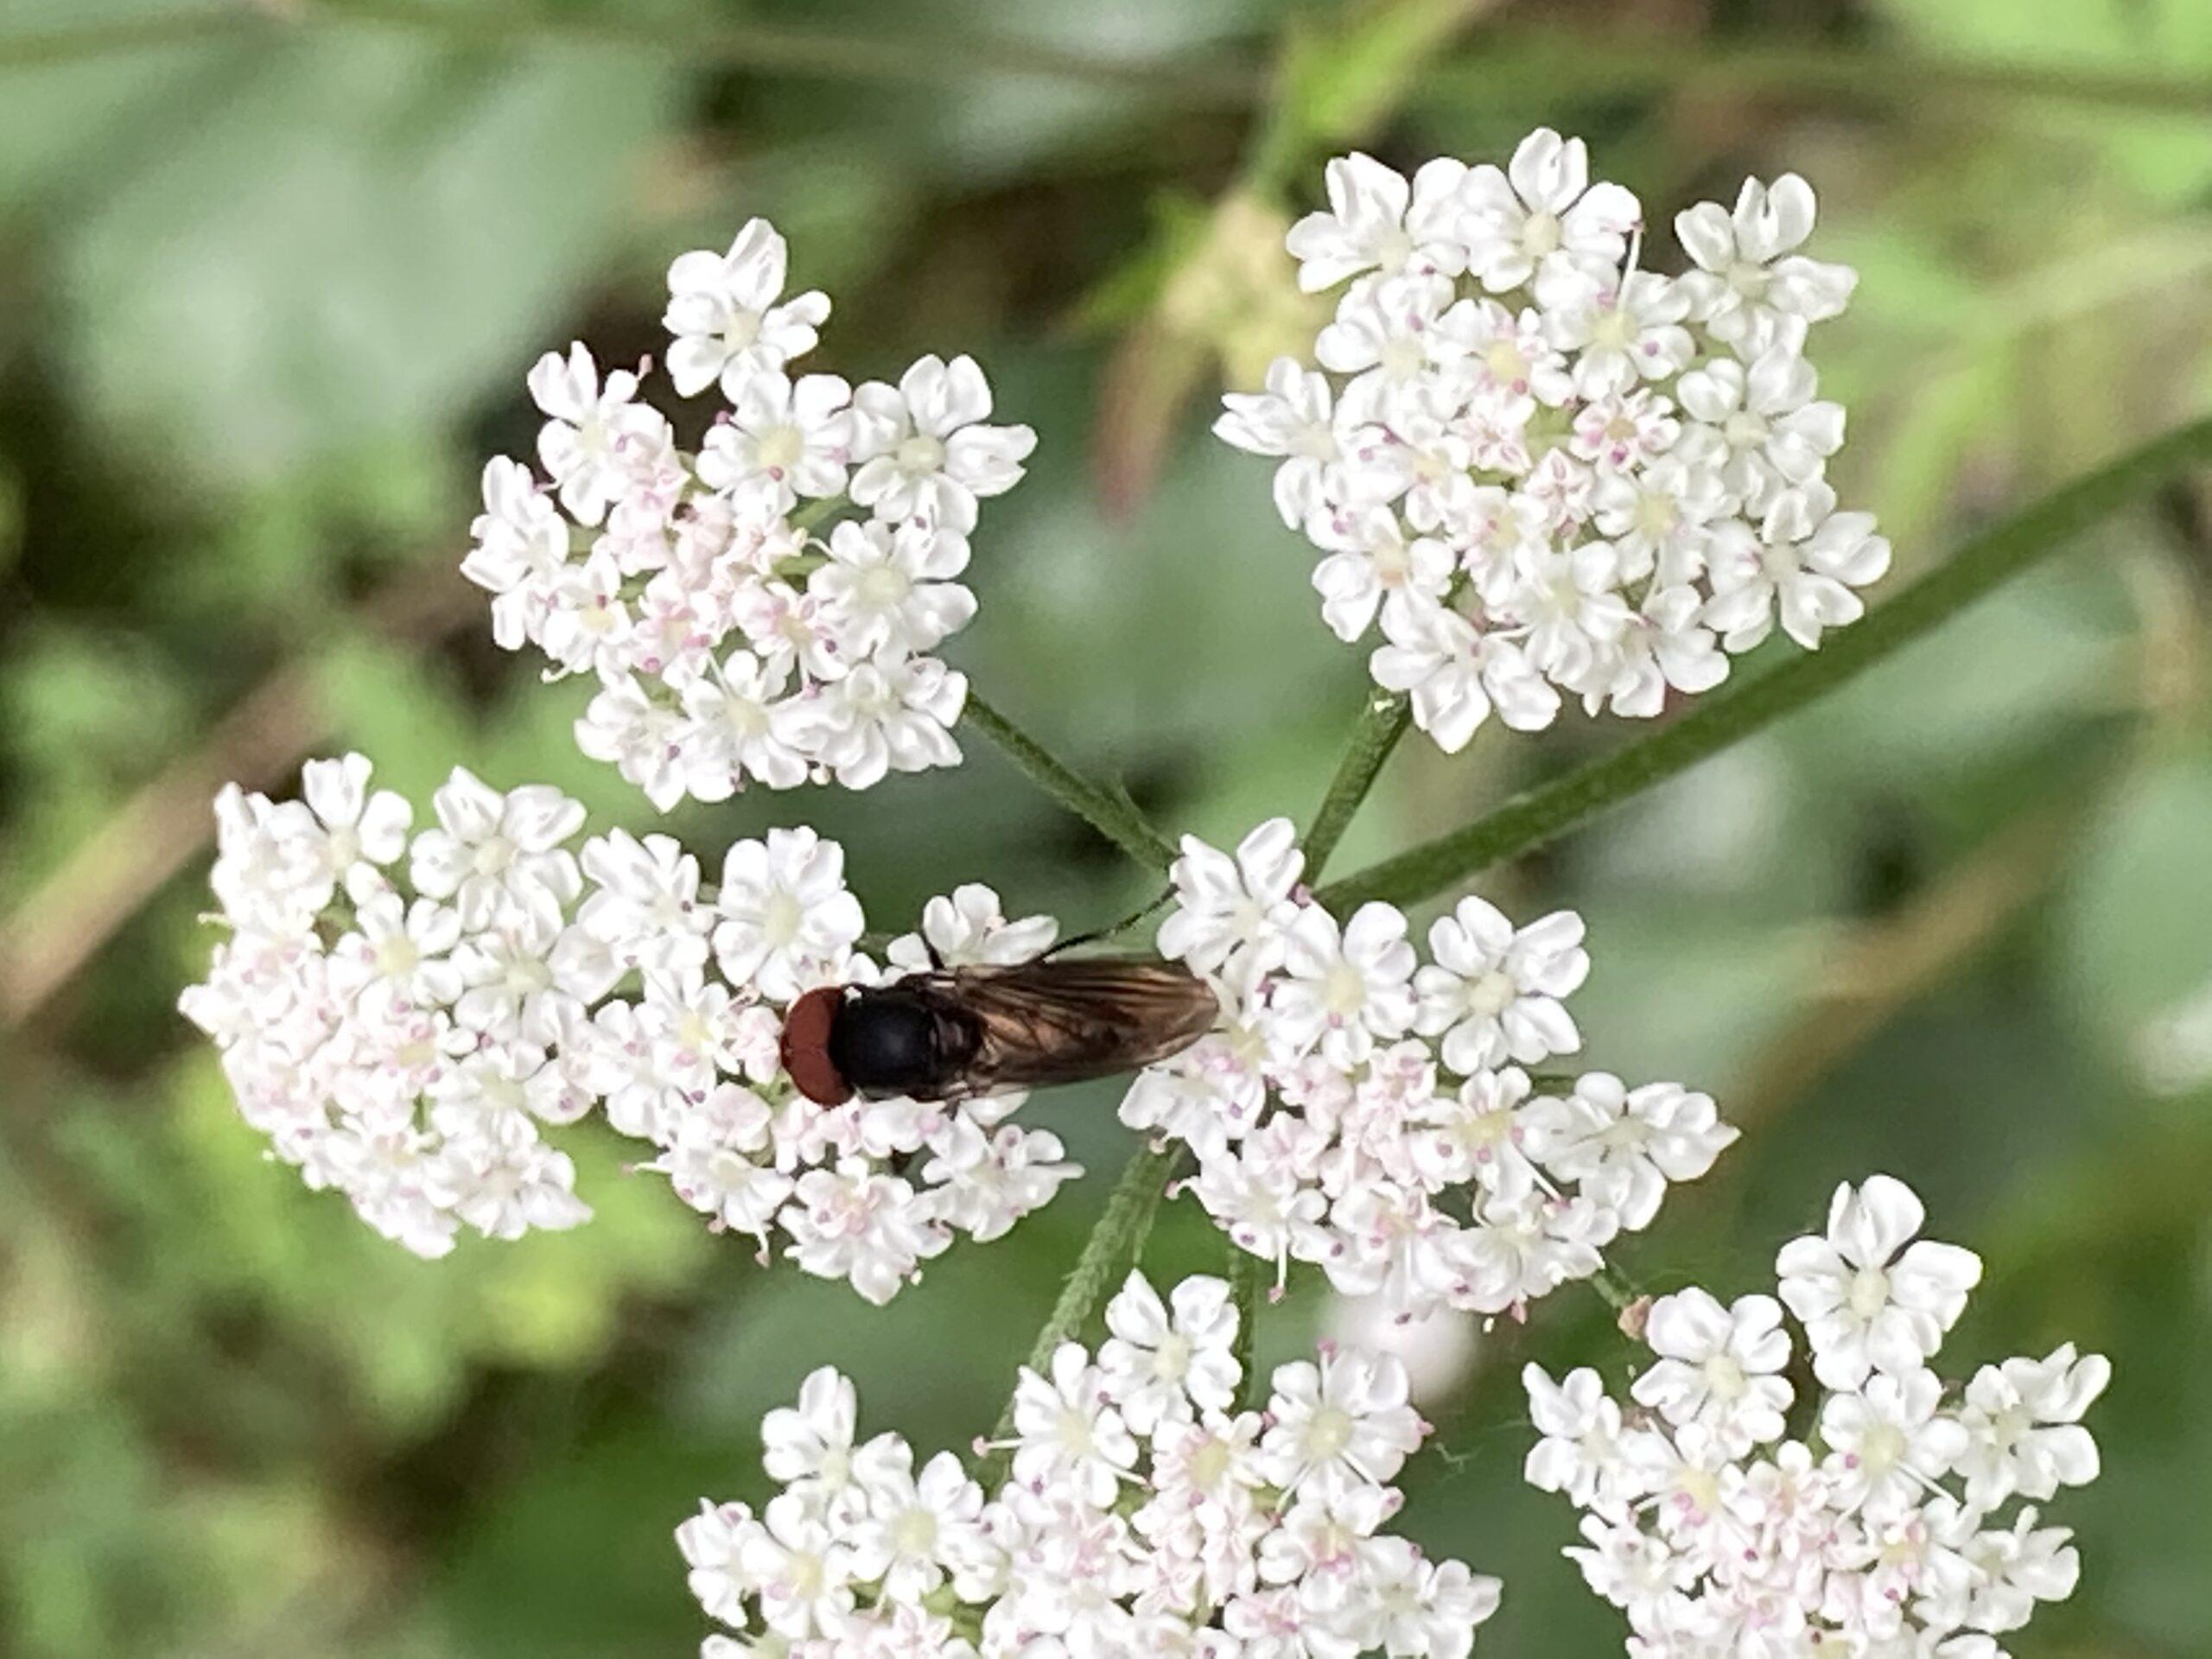 Hover fly - Rhingia campestas